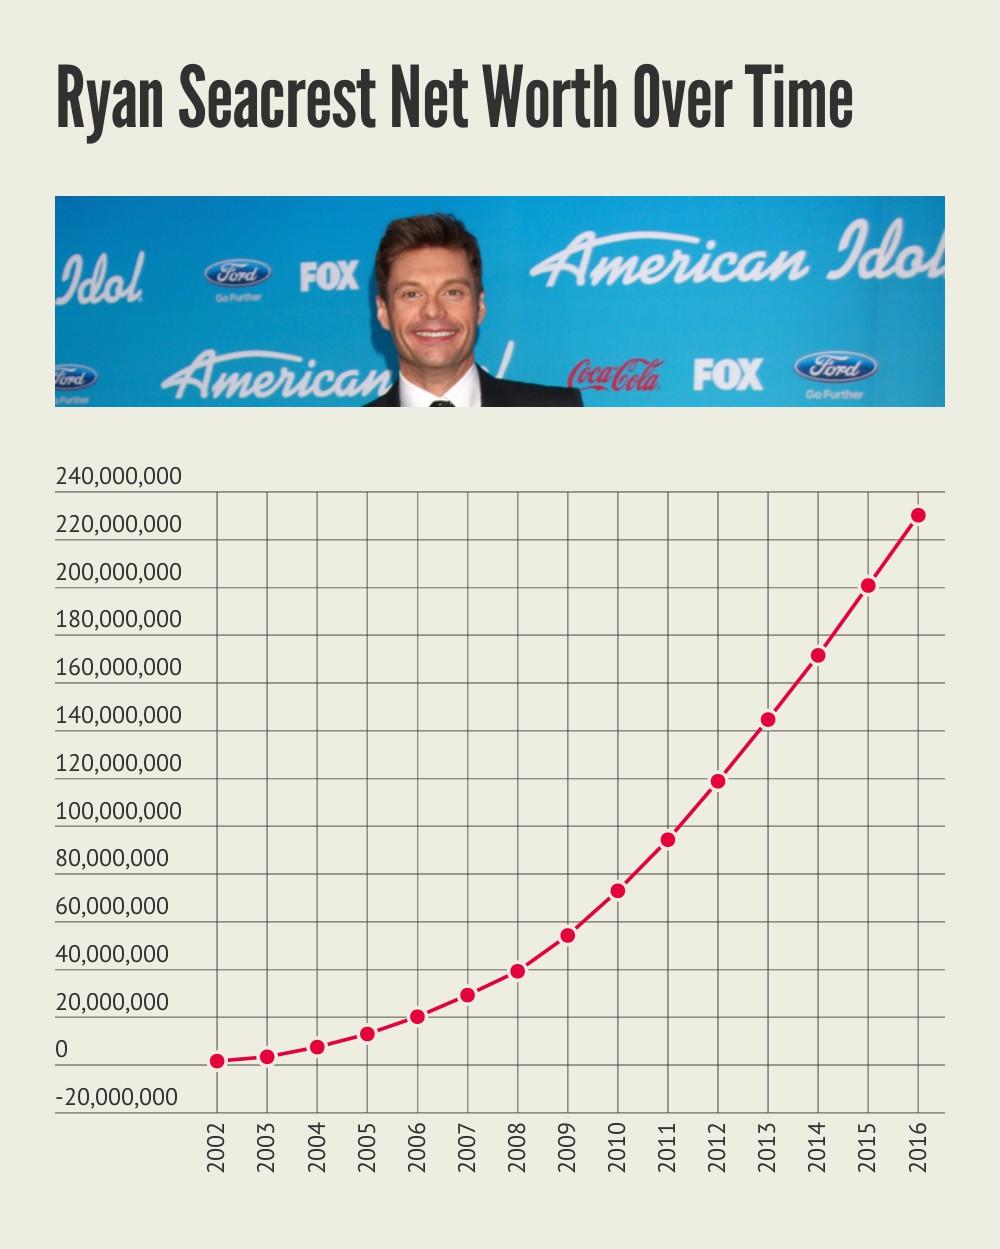 Ryan Seacrest Net Worth Over Time